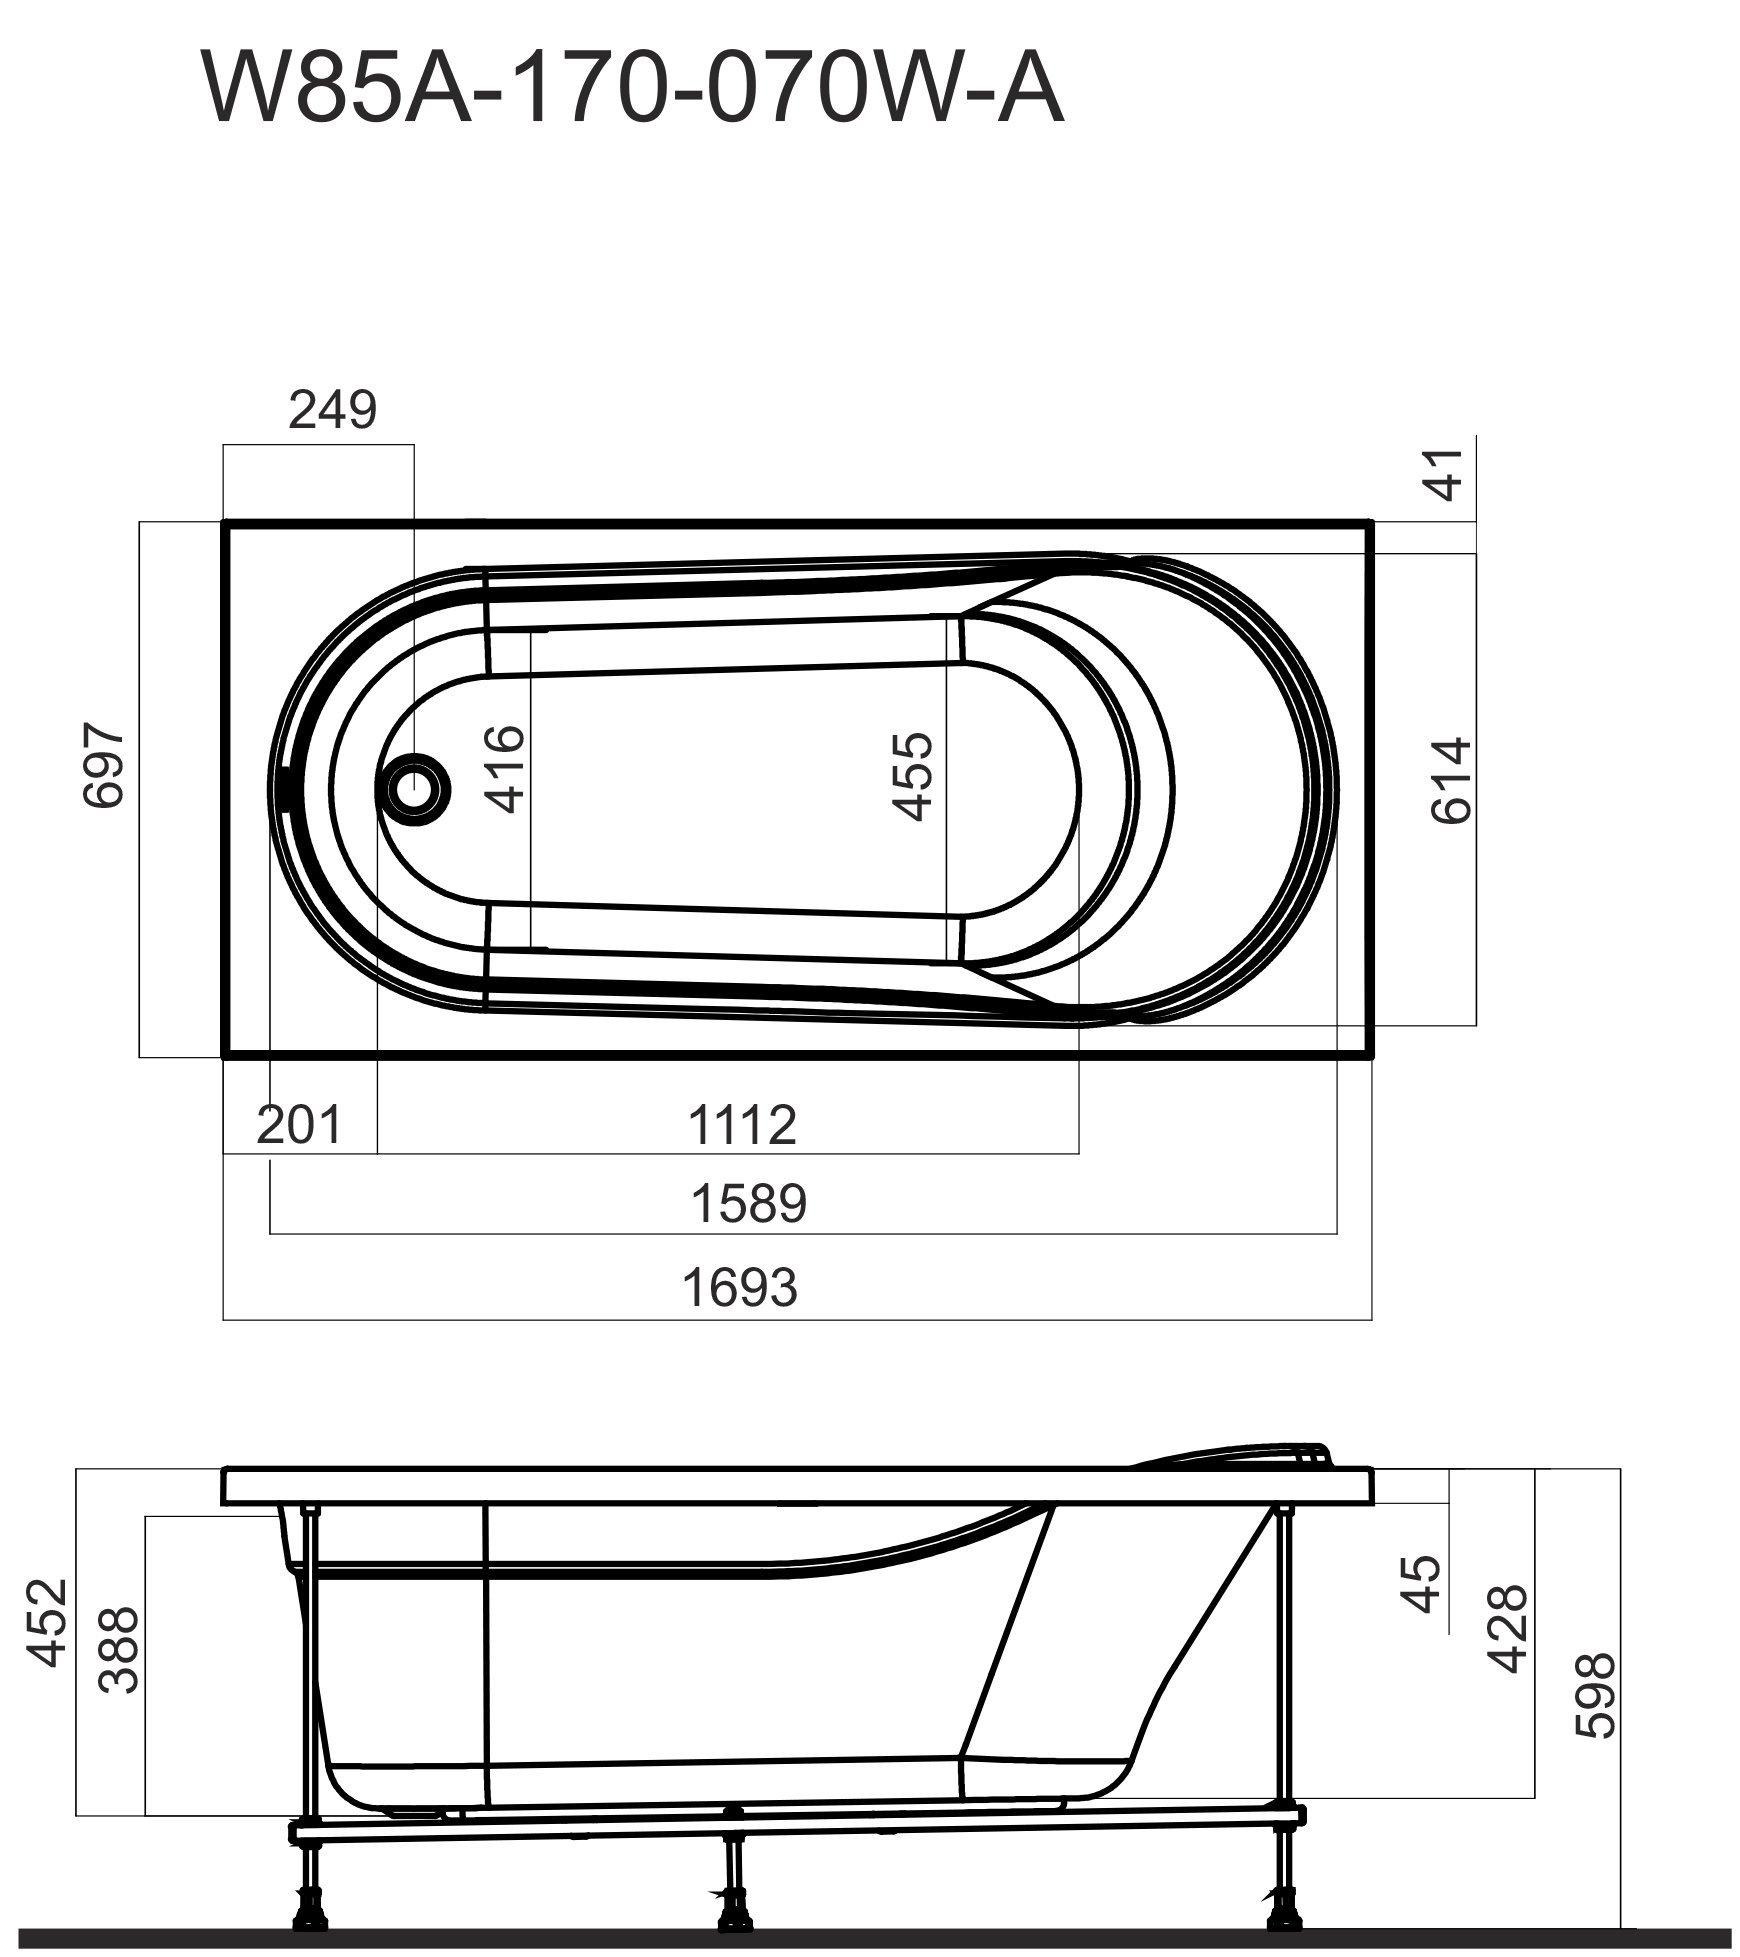 W85A-170-070W-S Joy, панель боковая  (универсальная) для ванн Joy/Spirit/Like, 70 см